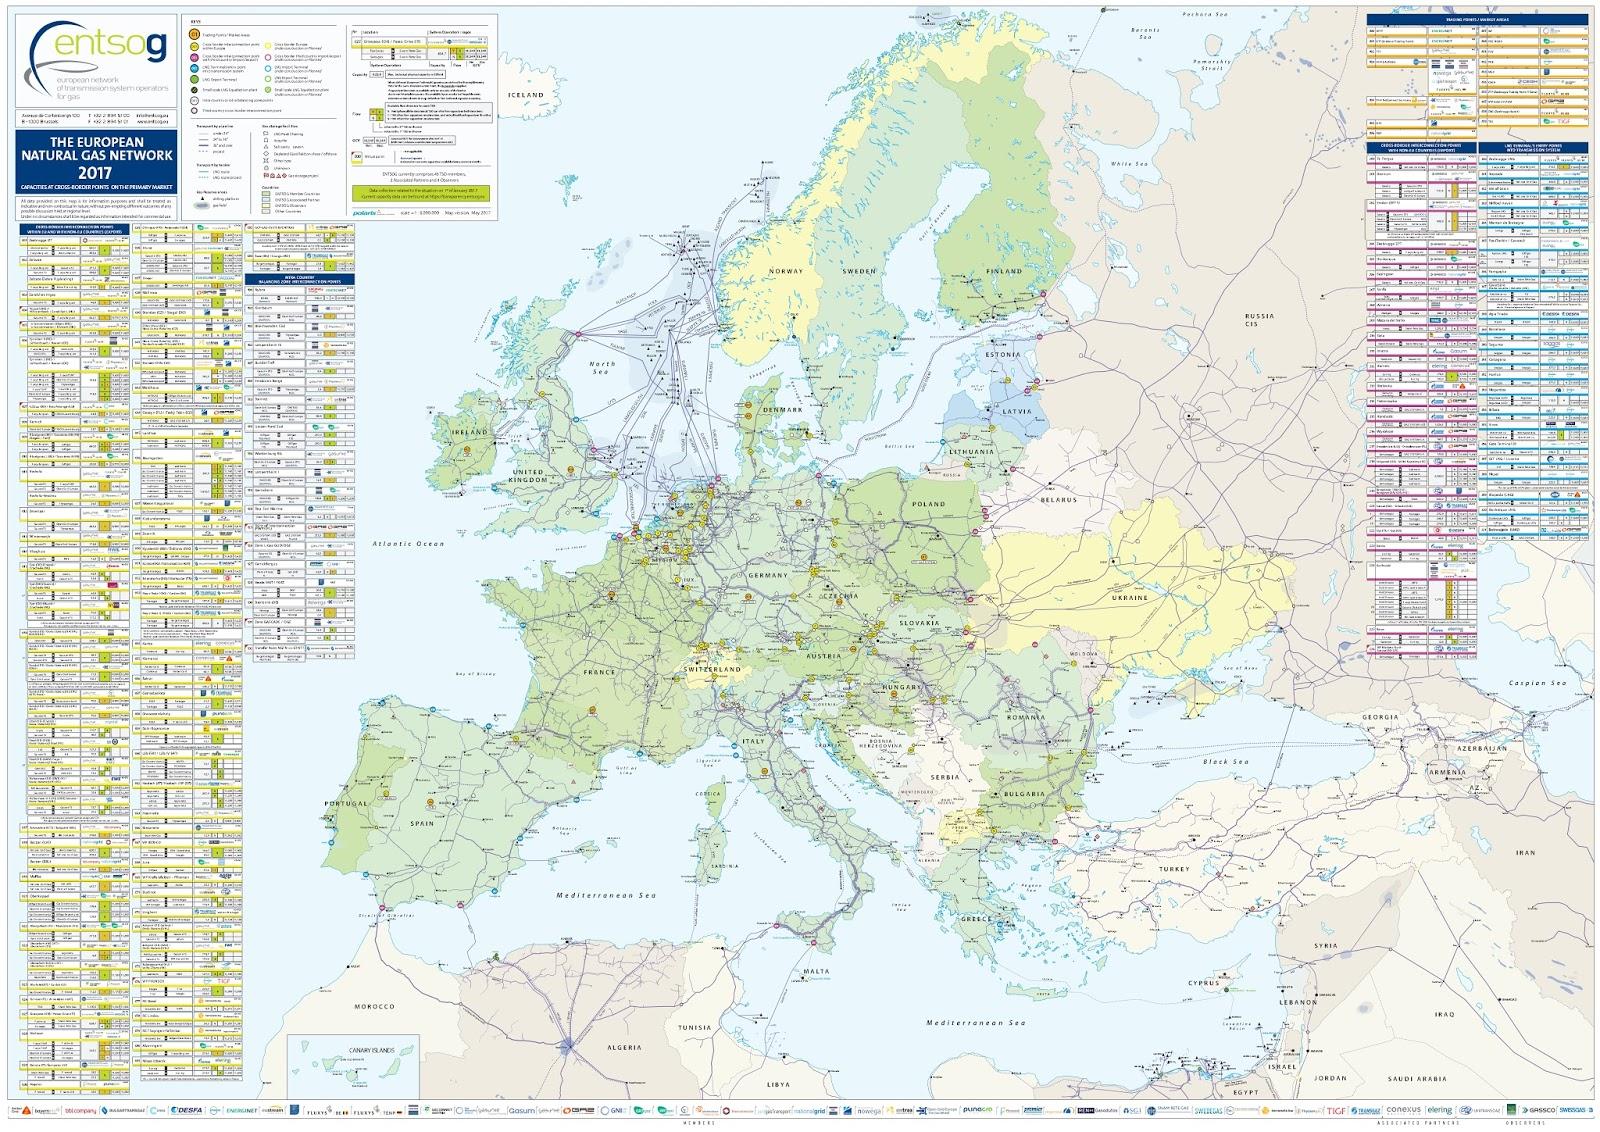 The European Natural Gas Network (2017)